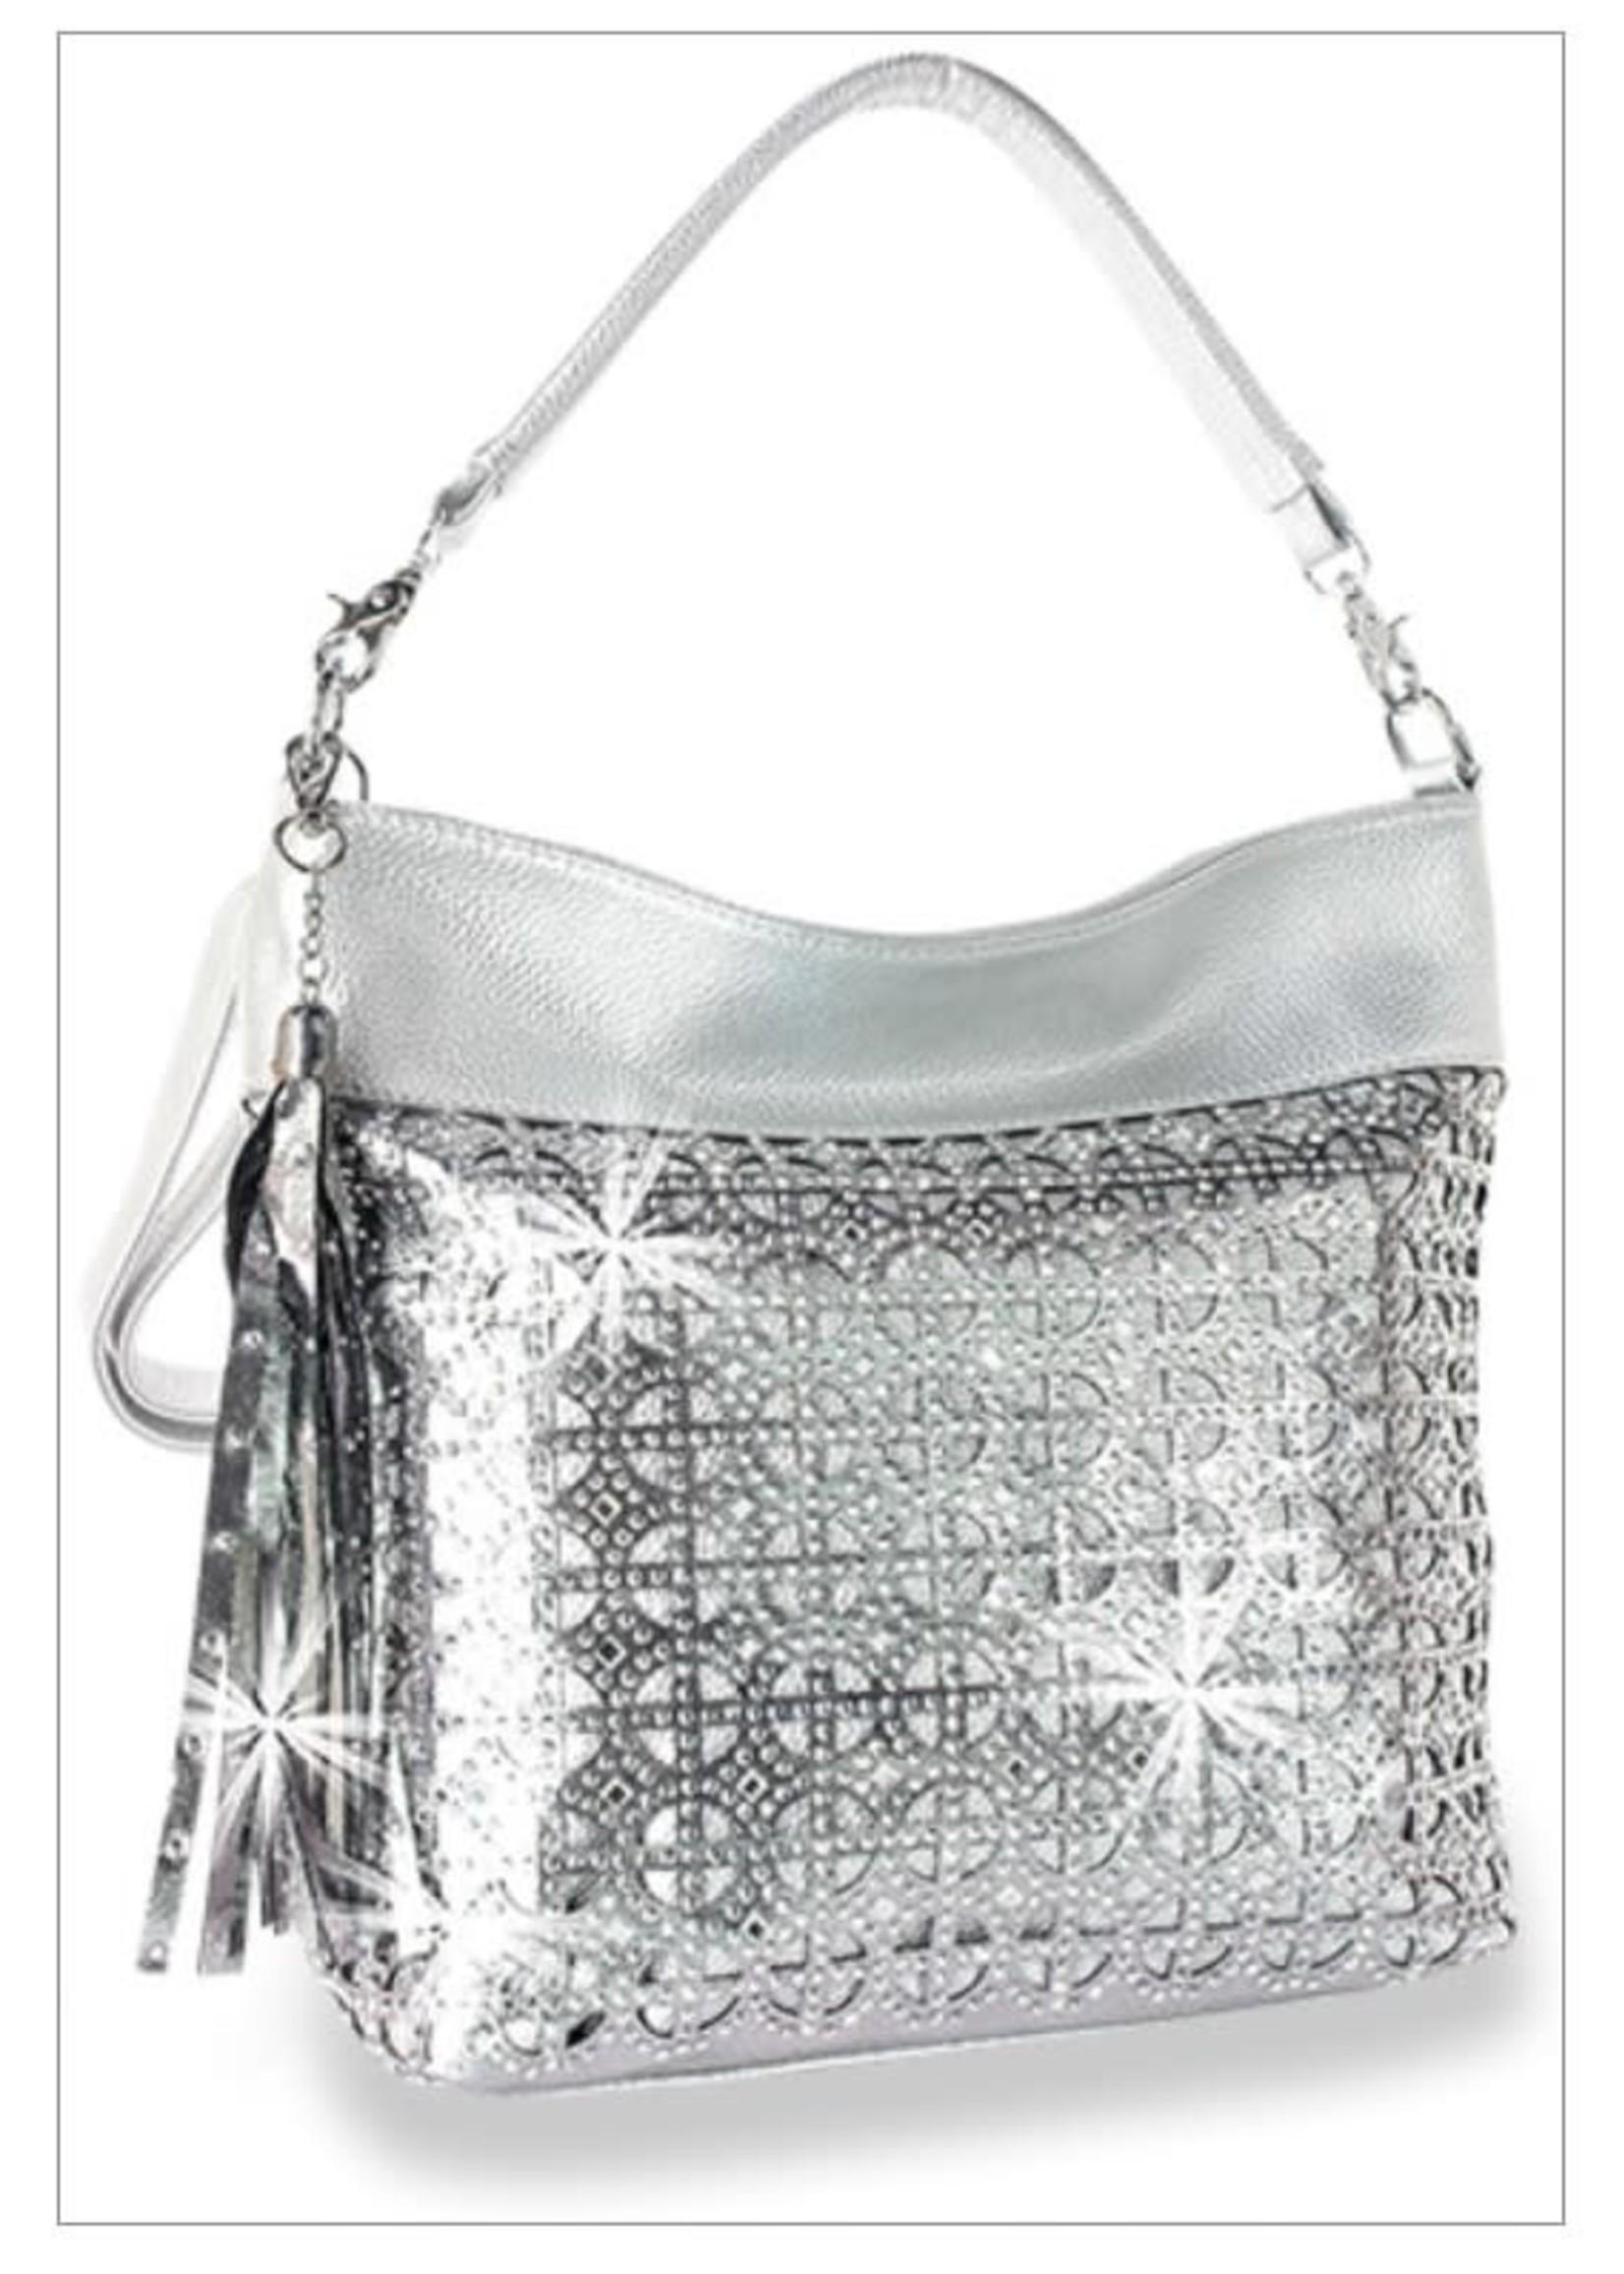 Hobo Handbag with Rhinestone Bling